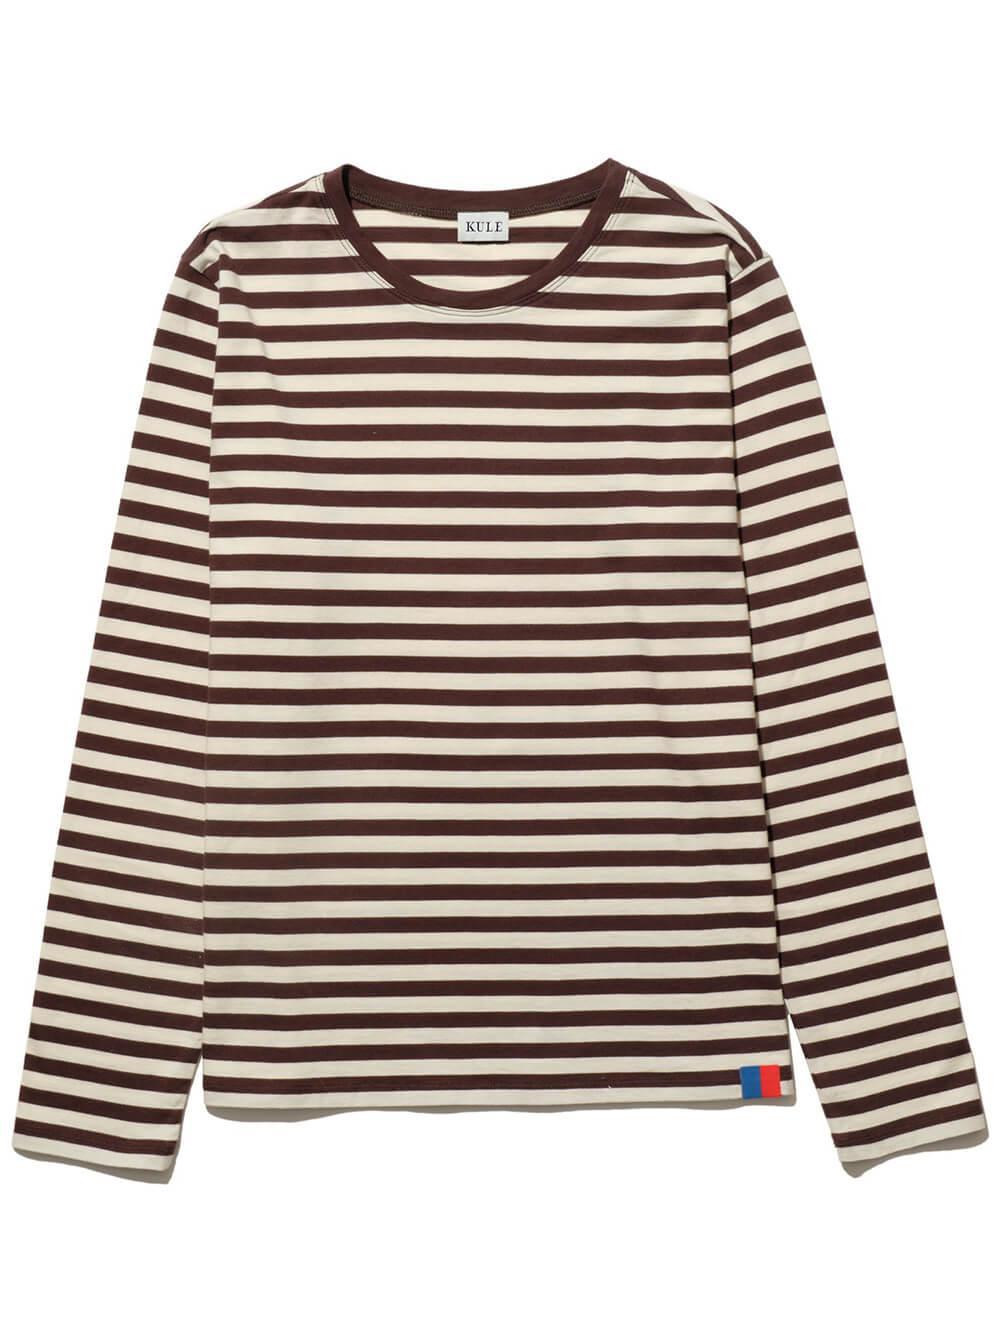 The Modern Long Sleeve Stripe Tee Item # ML01F3